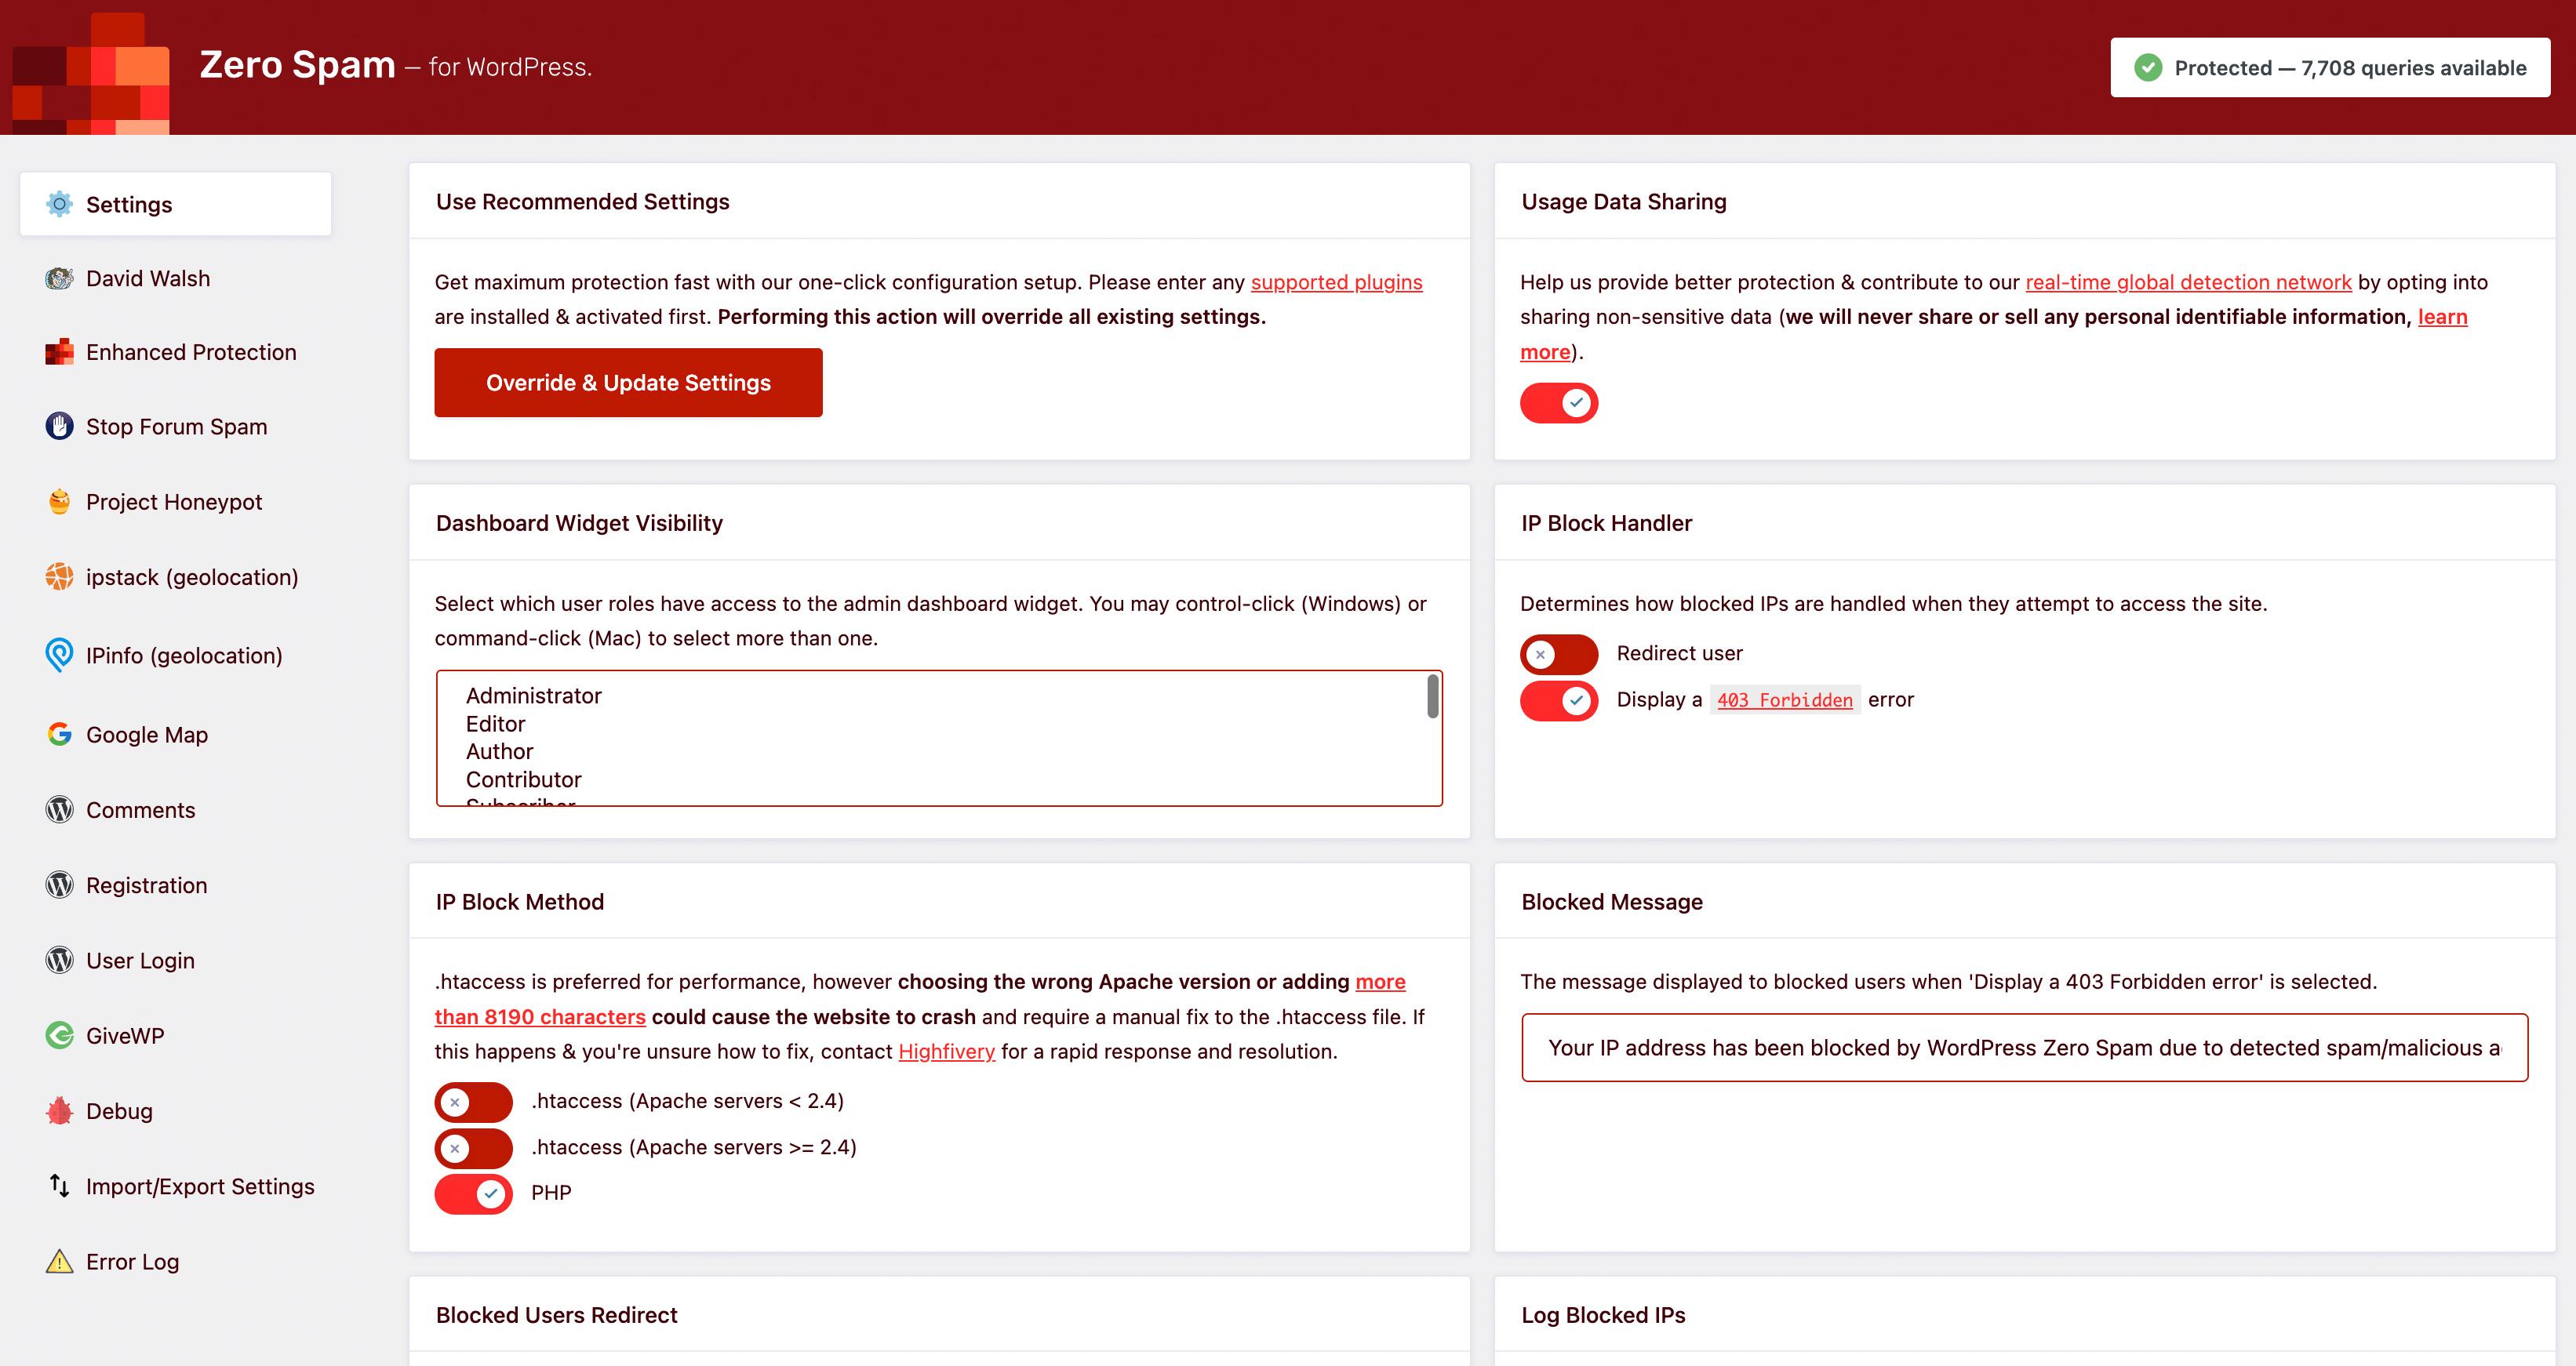 WordPress Zero Spam blocked IPs